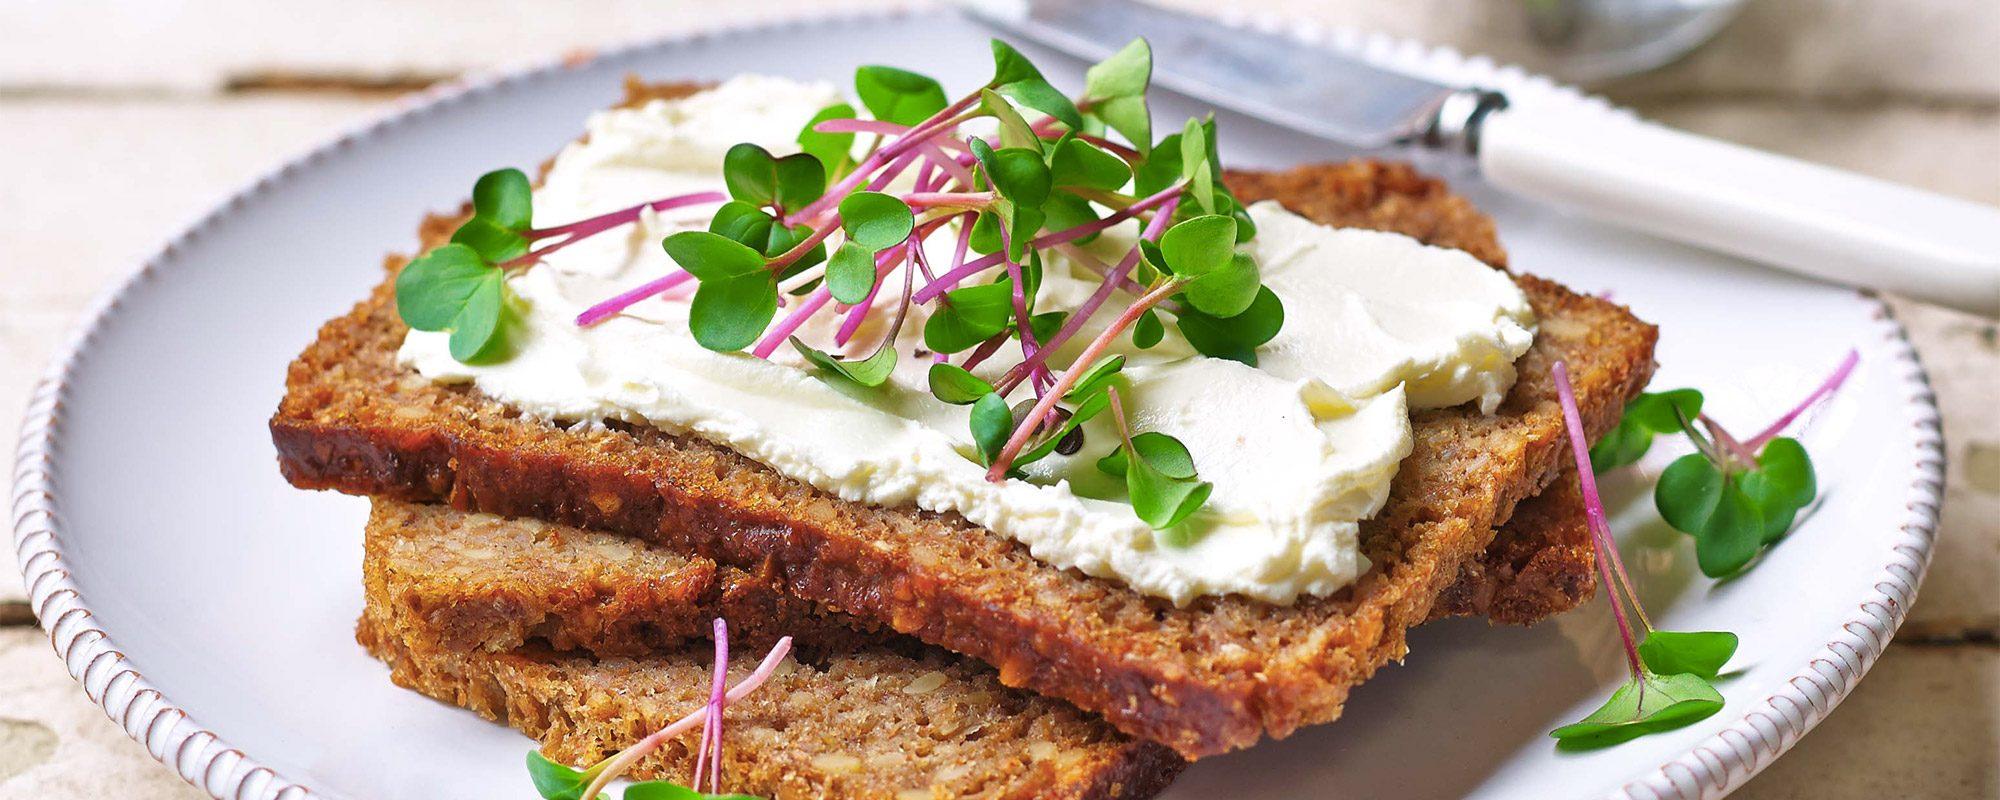 Cream Cheese and Pink Radish on Rye Bread